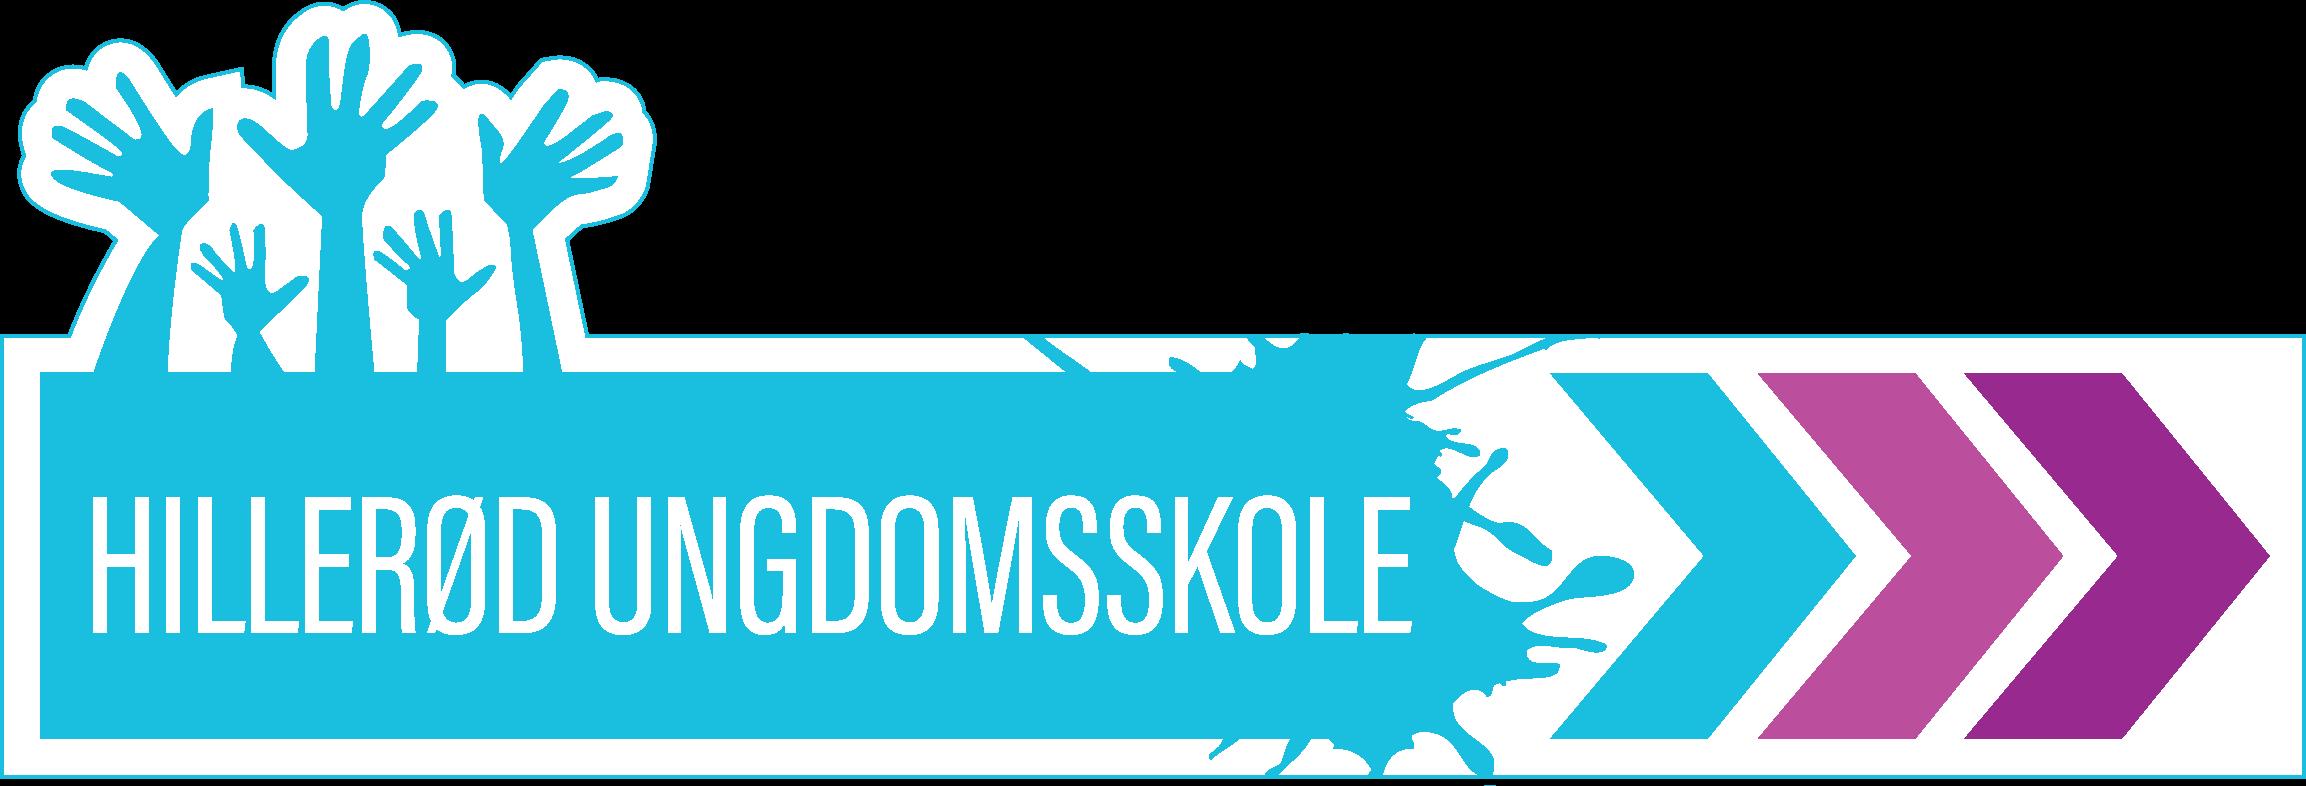 Hillerød Ungdomsskole logo